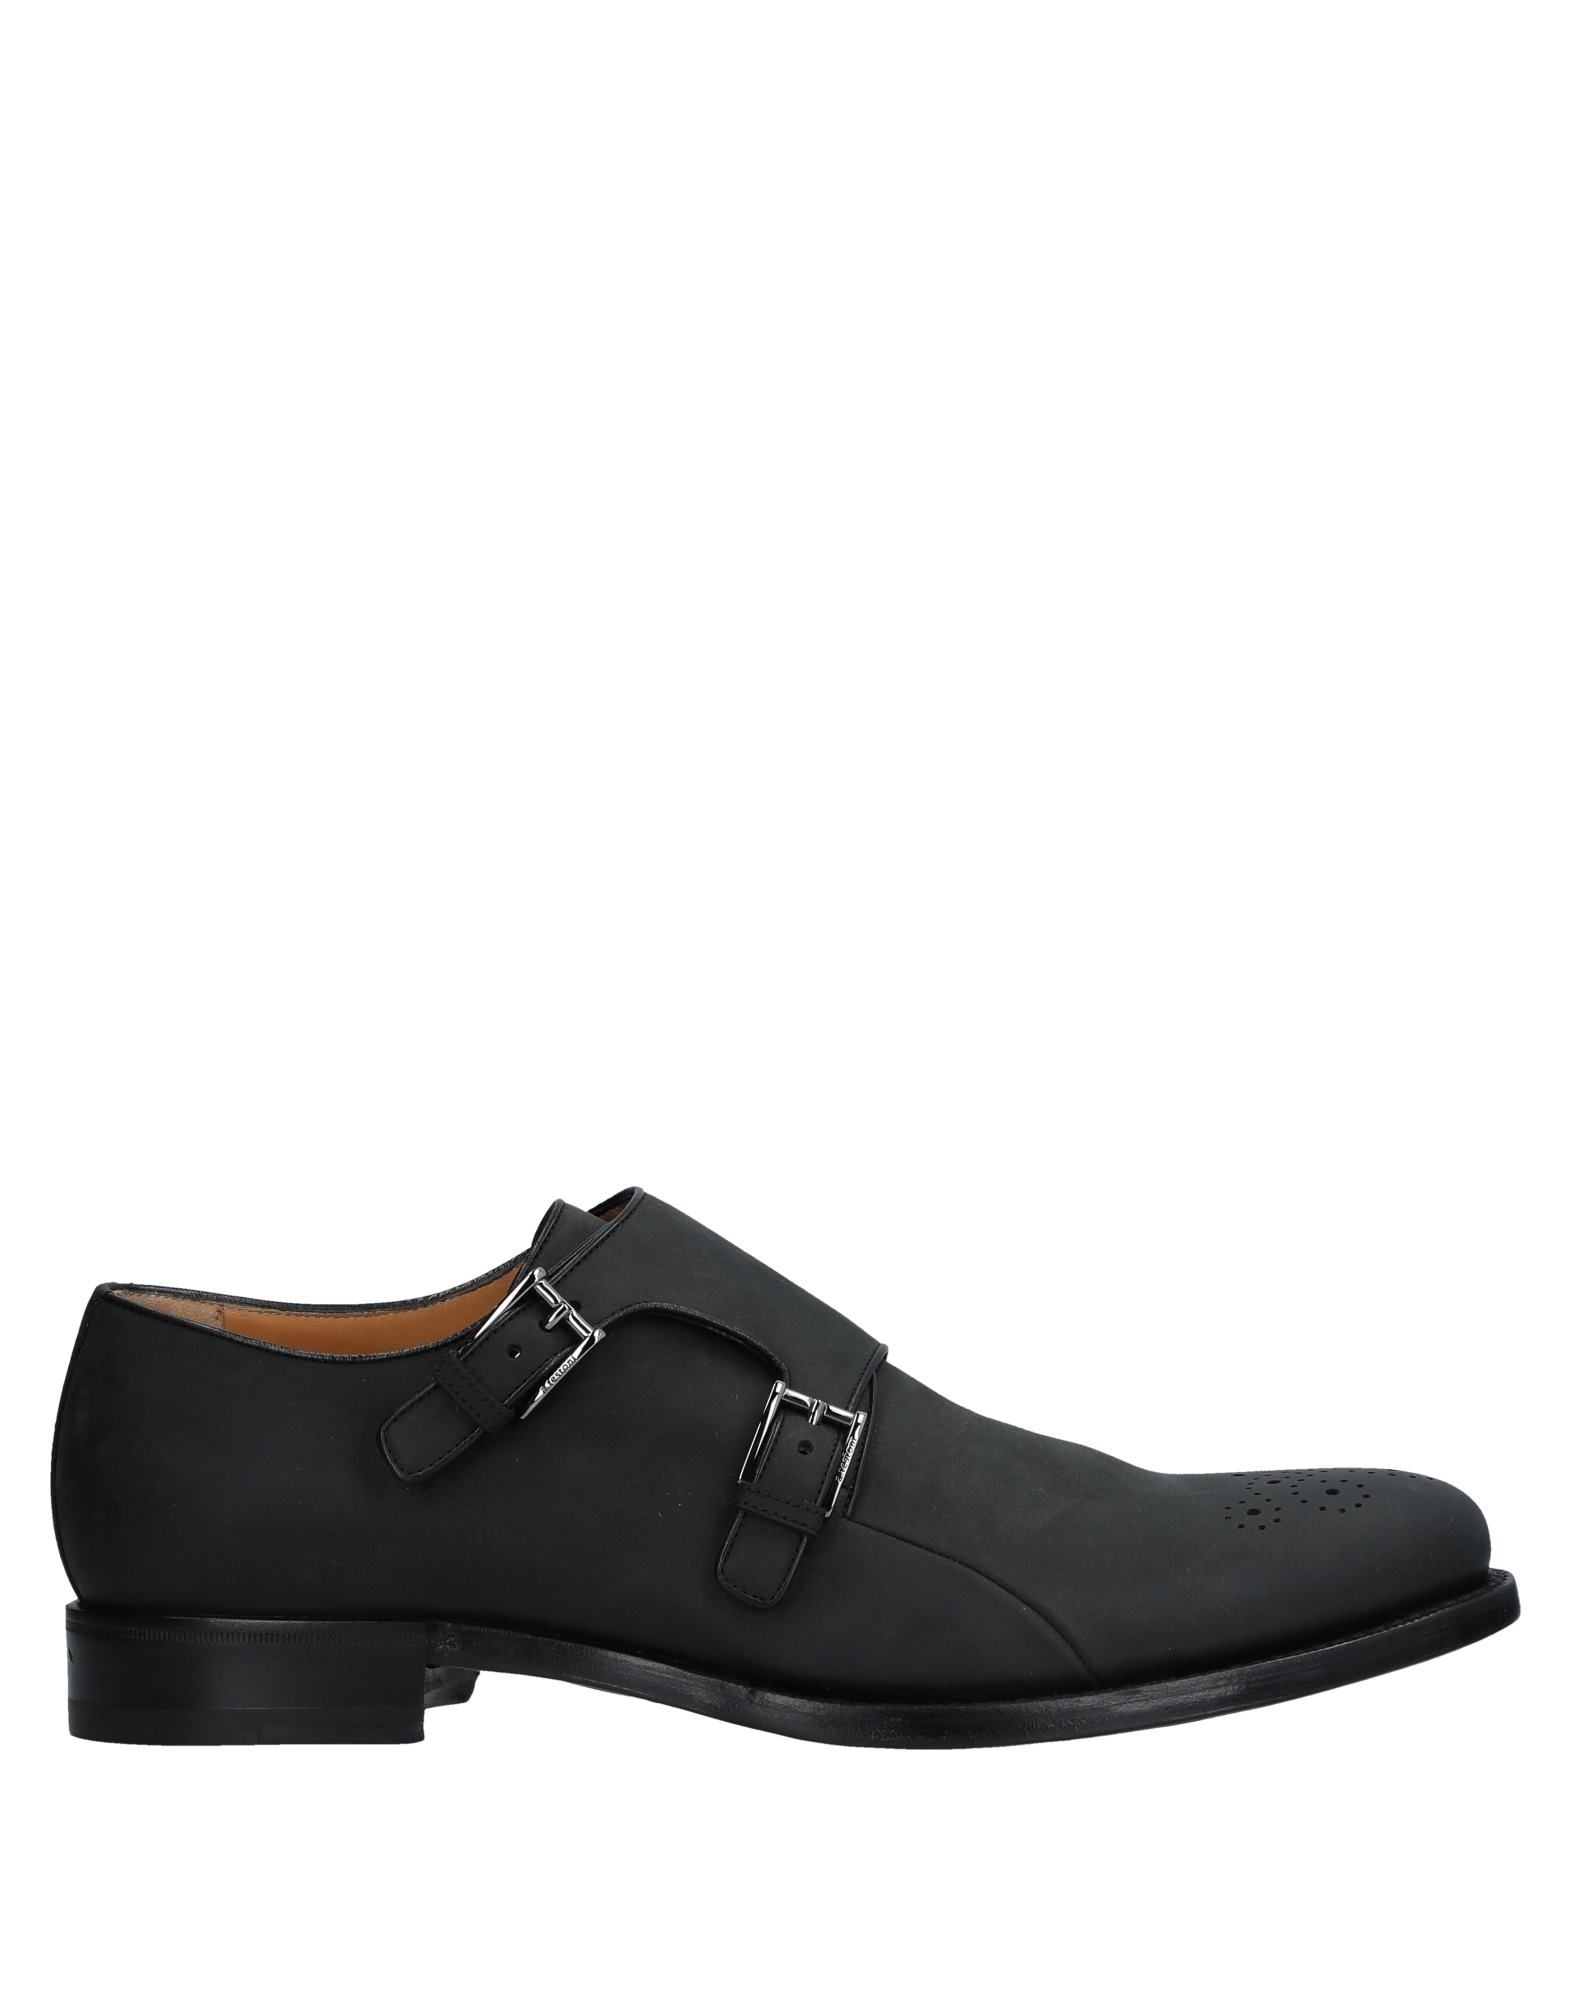 A.Testoni Mokassins Herren  11543704BD Gute Qualität beliebte Schuhe